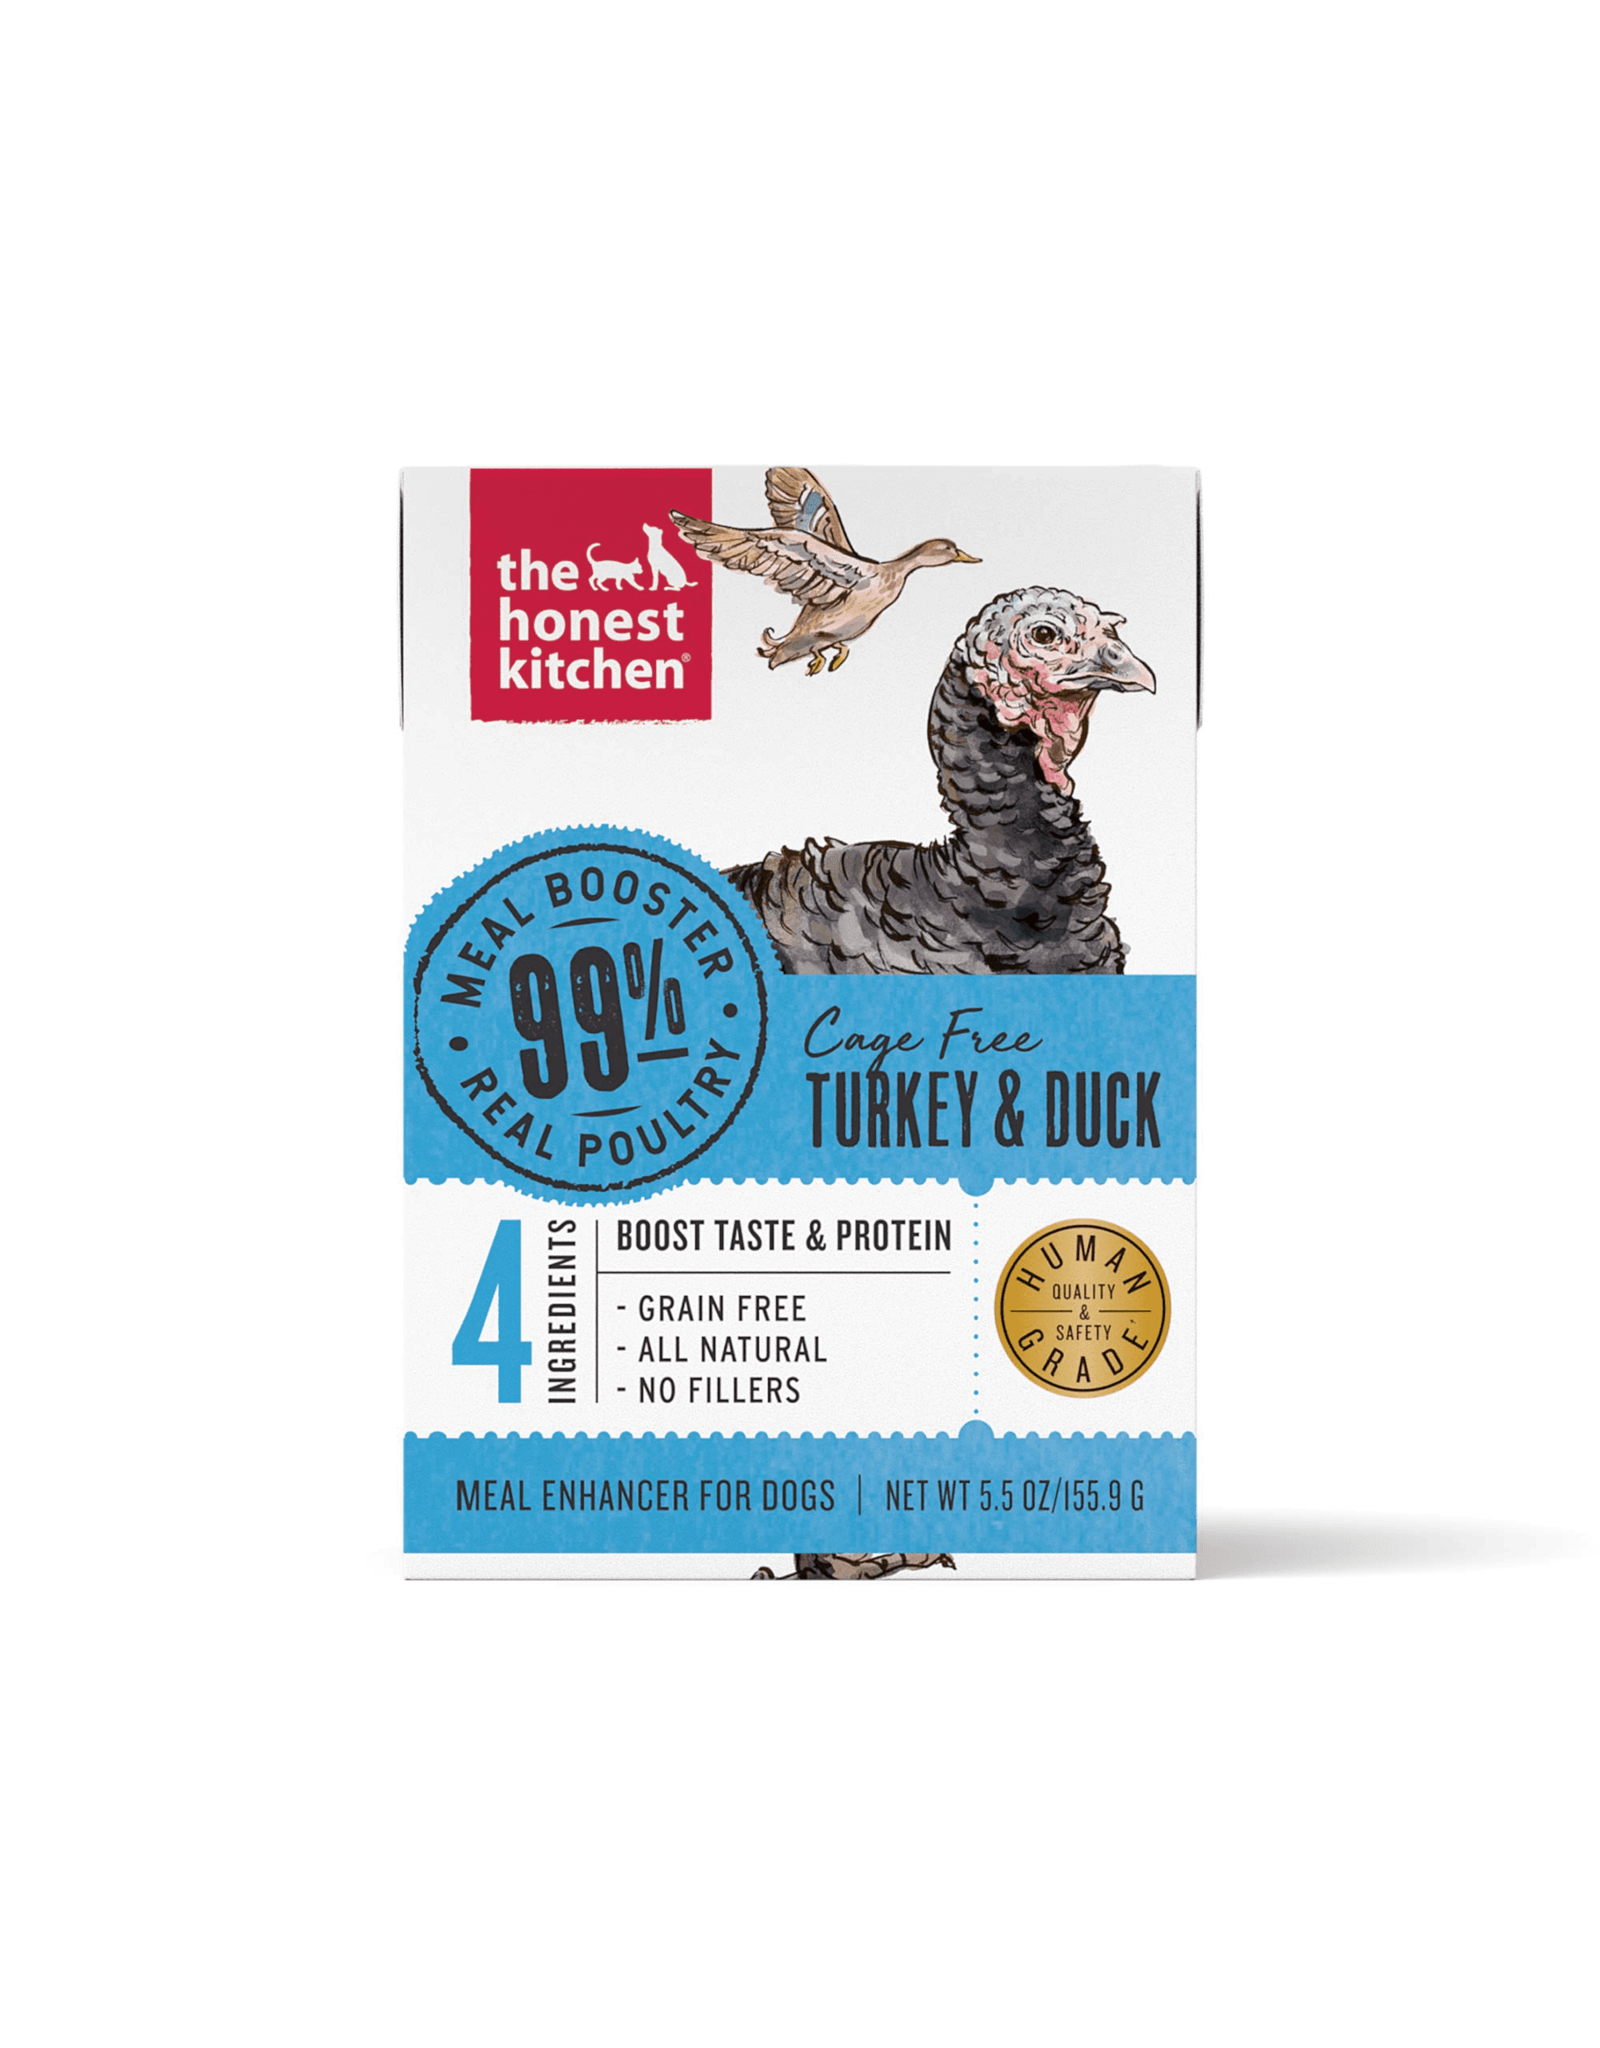 The Honest Kitchen THE HONEST KITCHEN MEAL BOOSTER 99% CAGE FREE TURKEY & DUCK 5.5OZ